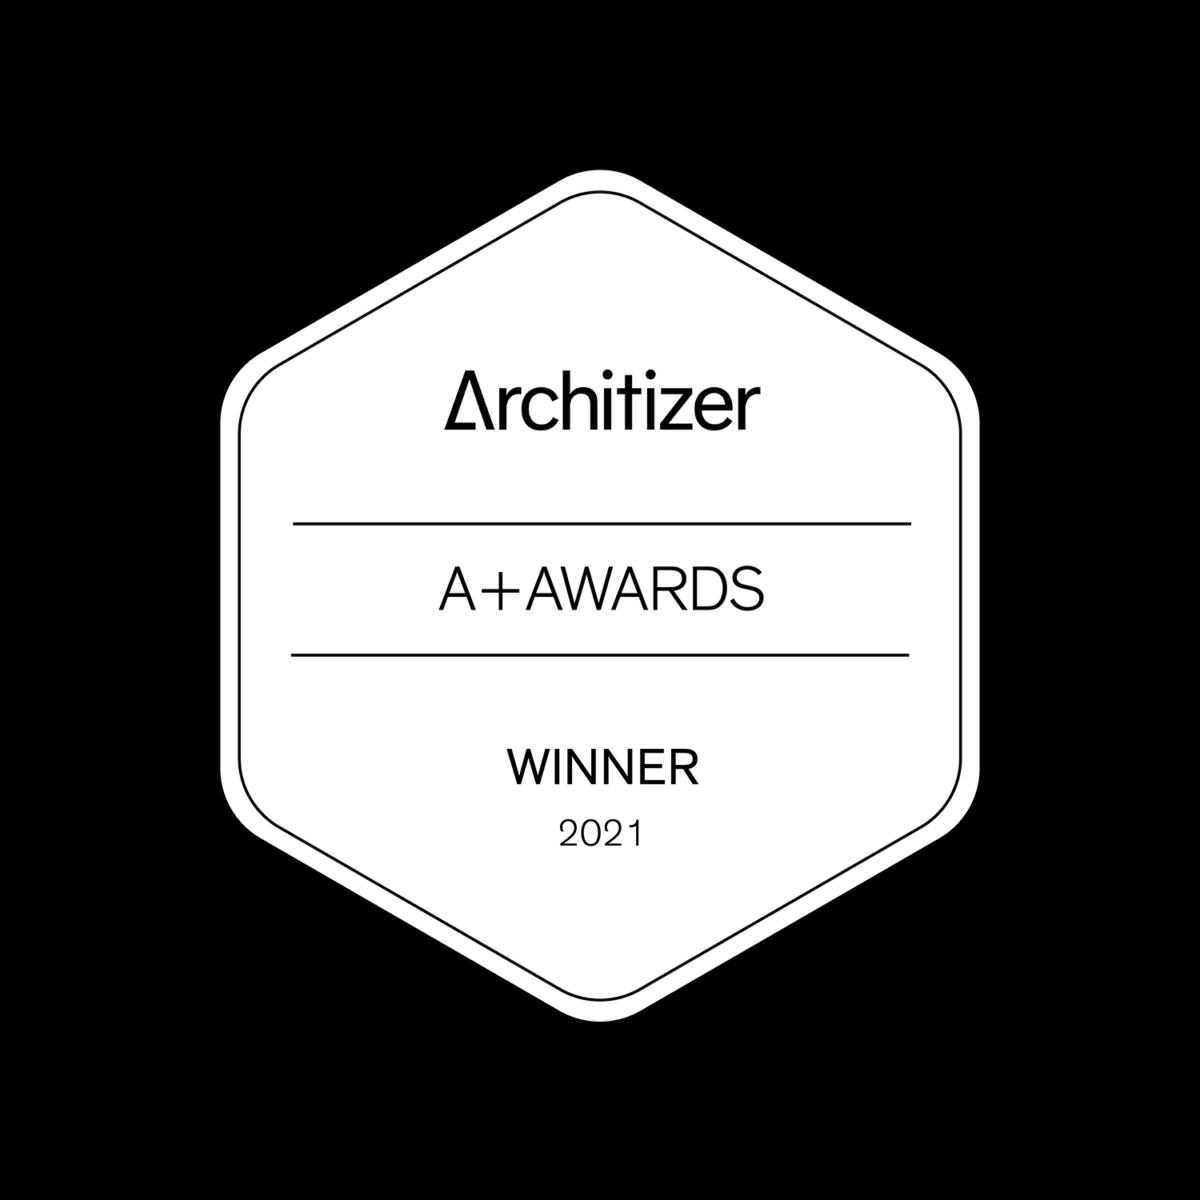 Architizer A+ Awards winner